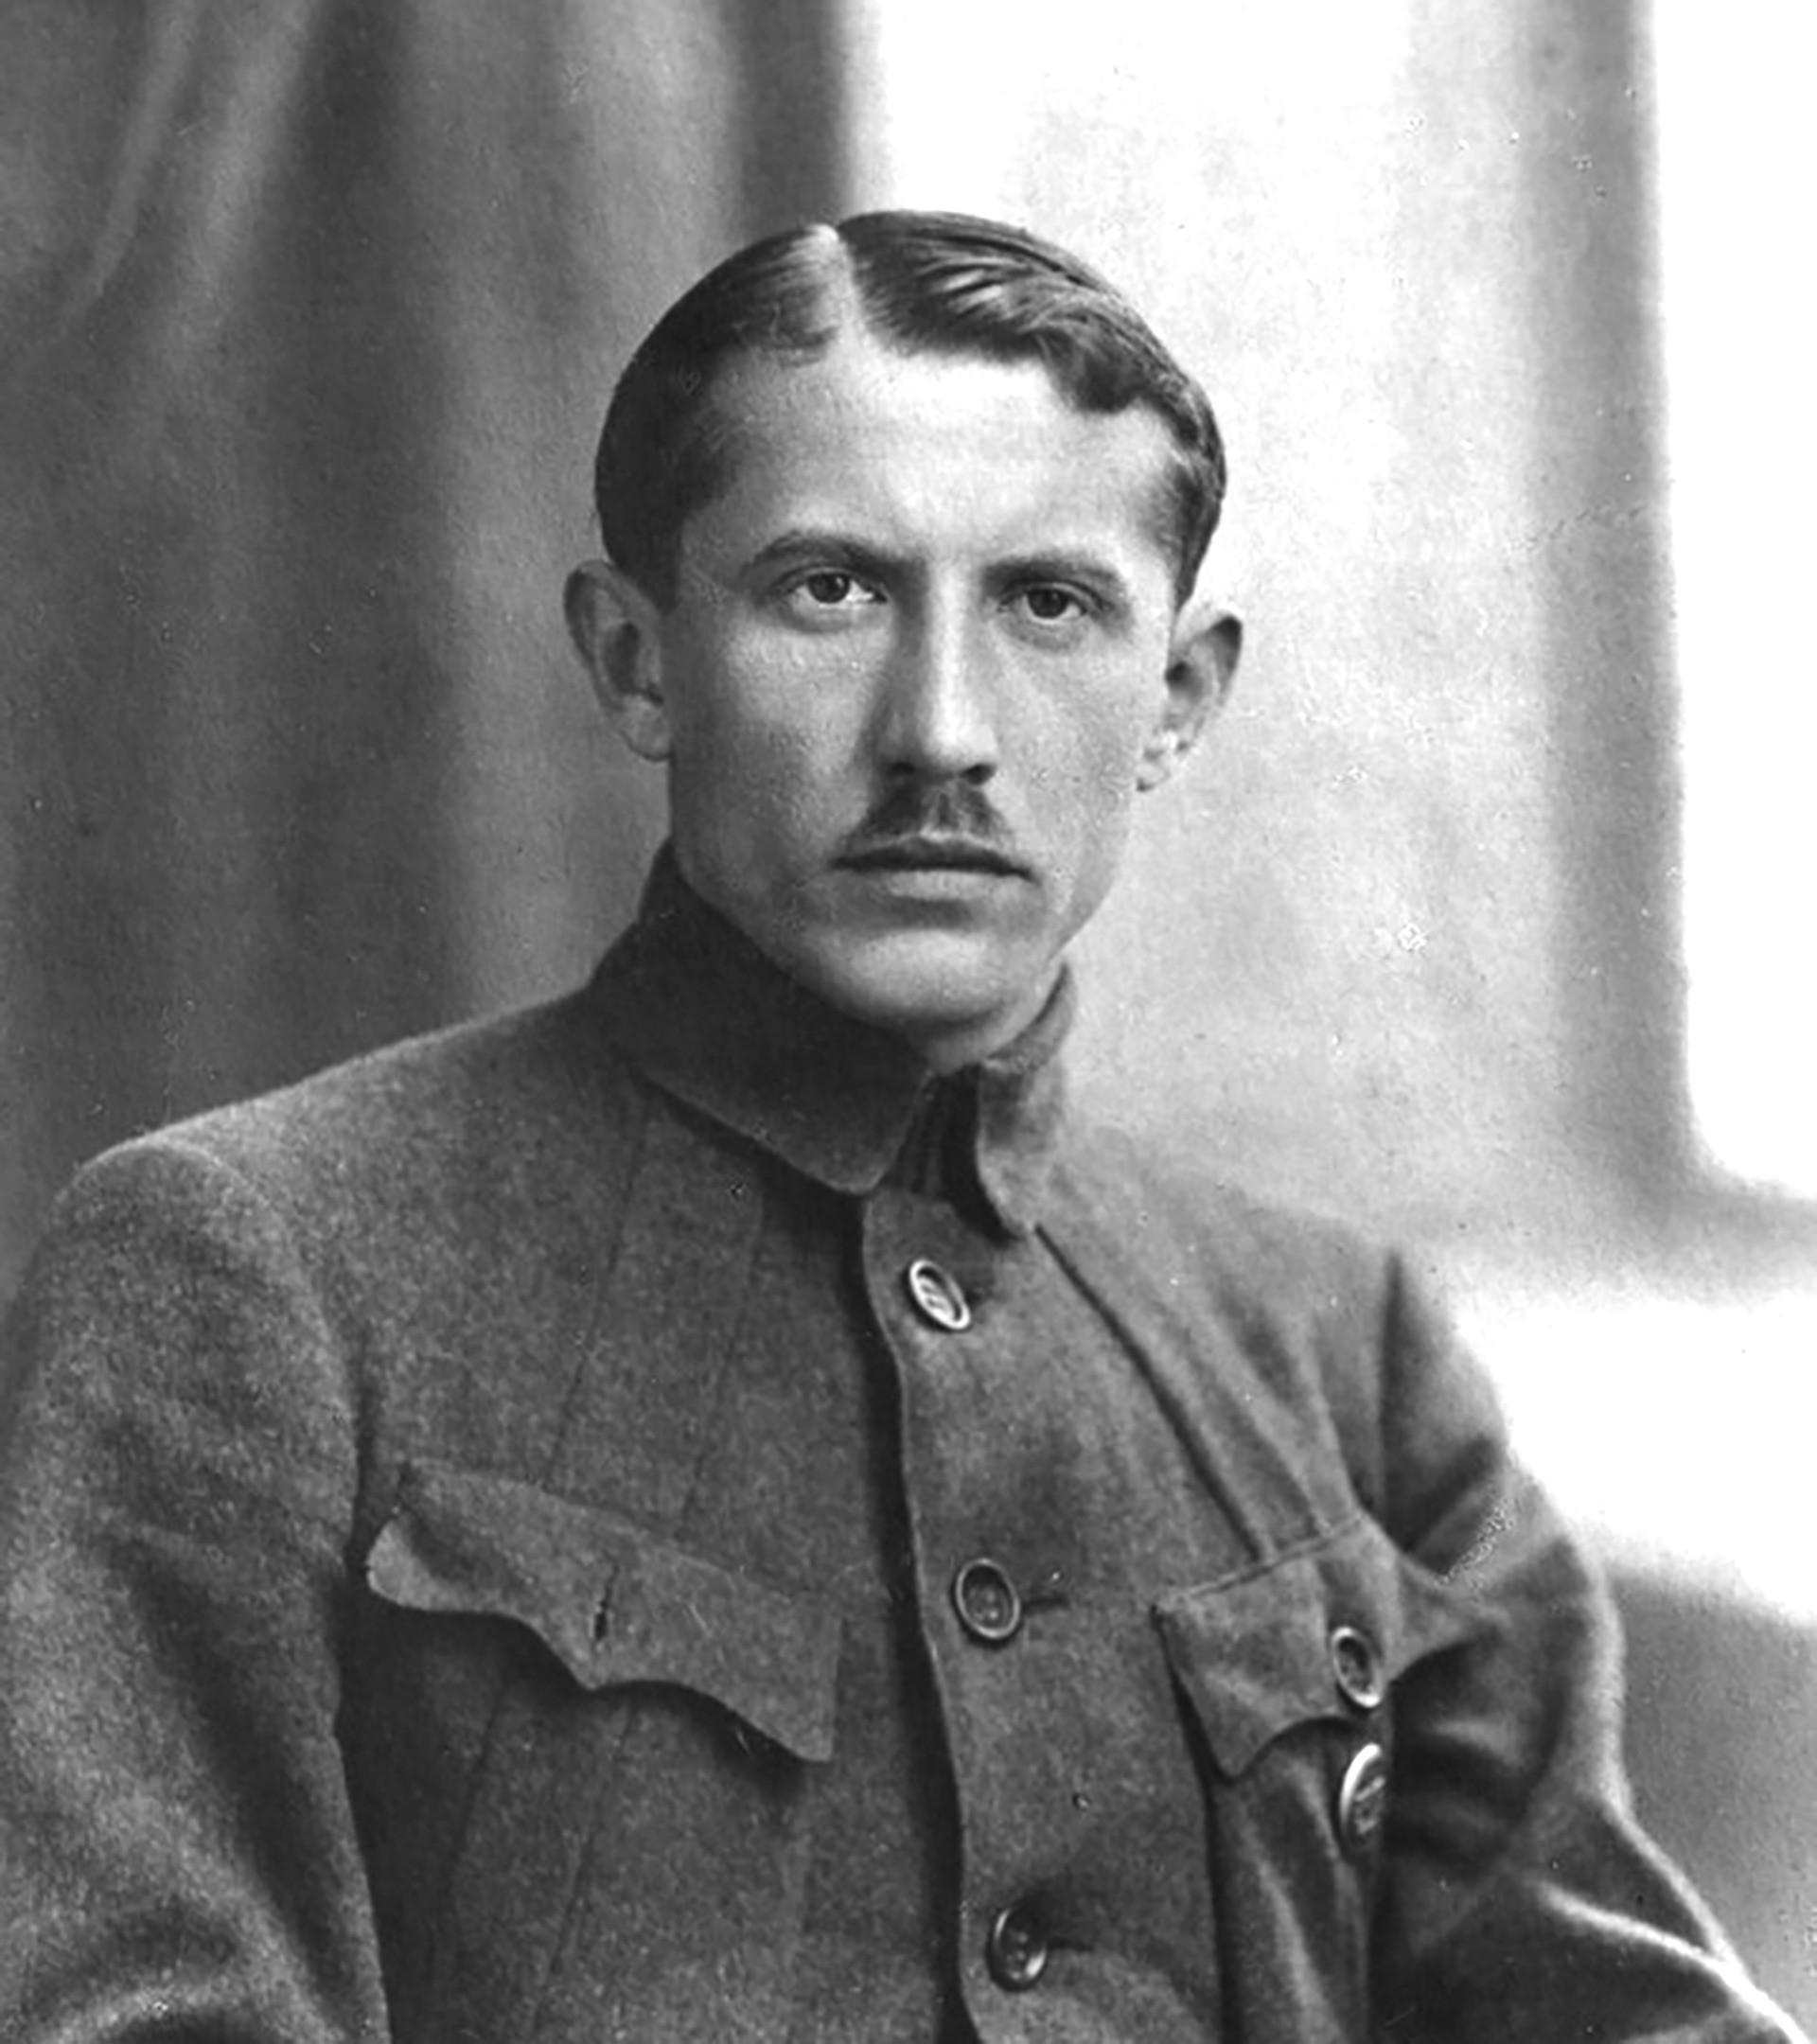 Yevhen Konovalets, seorang nasionalis Ukraina yang dibunuh oleh Sudoplatov.